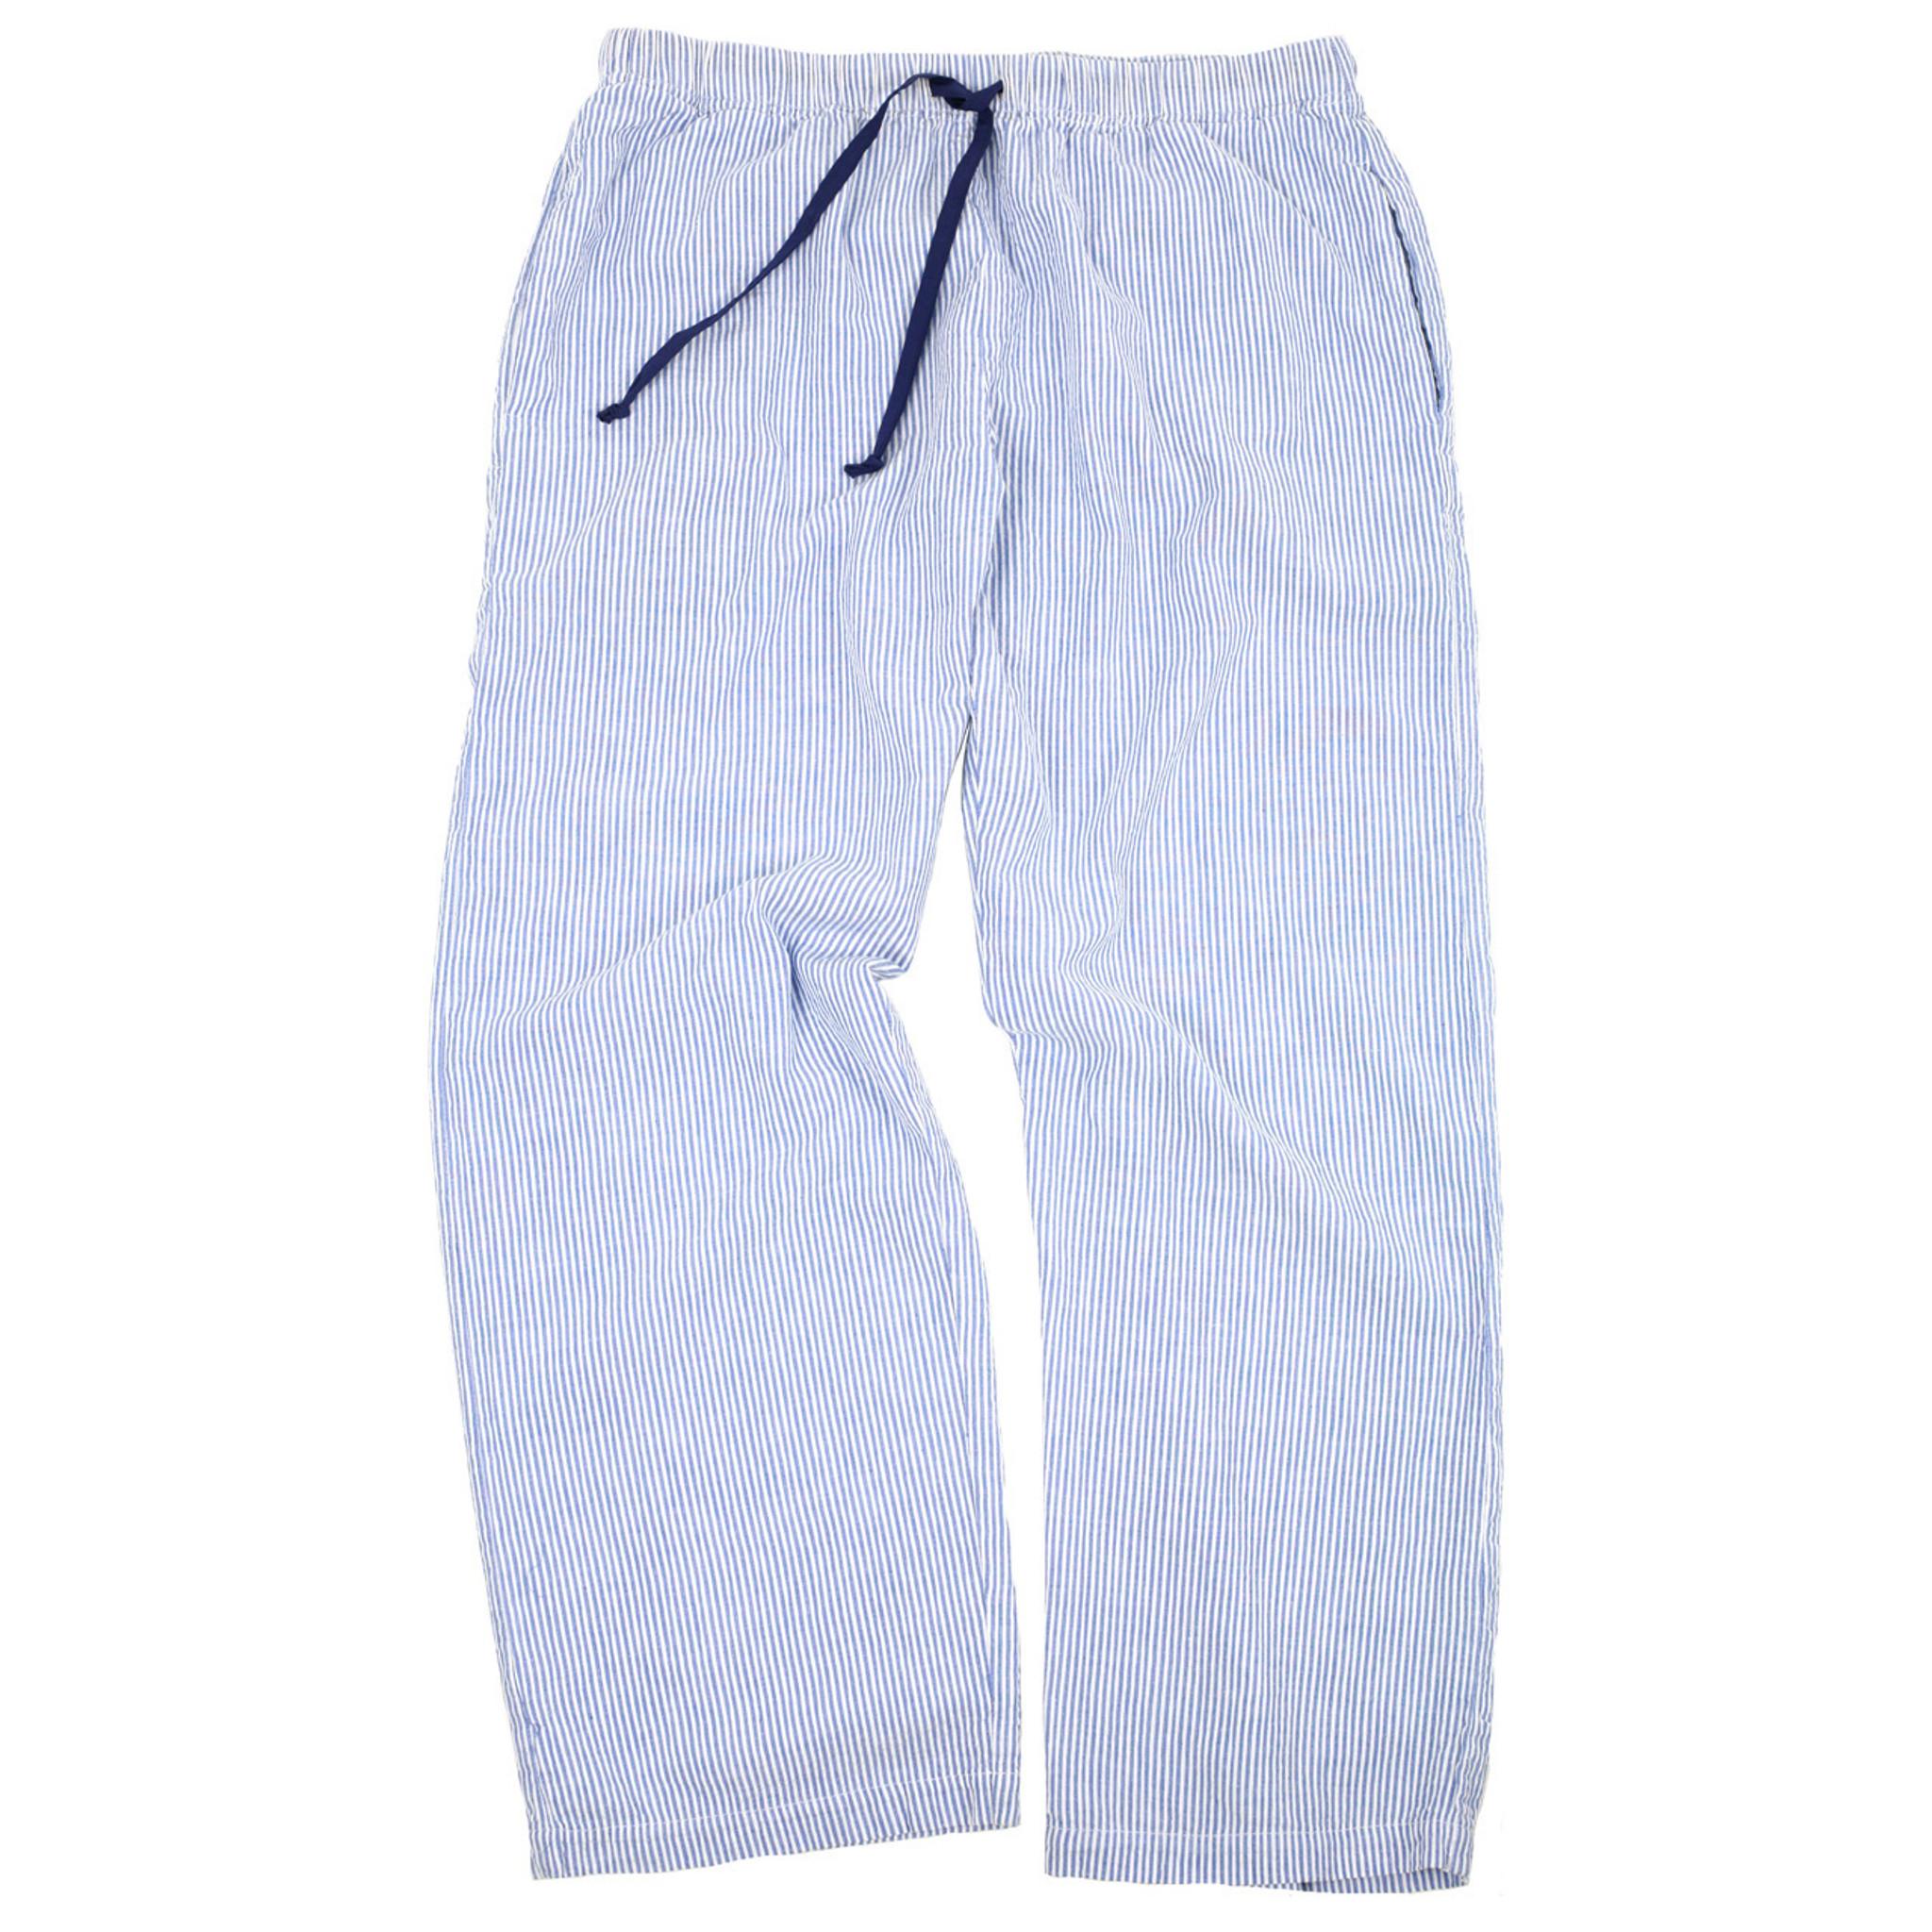 Blue Seersucker Cotton Lounge Pants Needham Lane Ltd